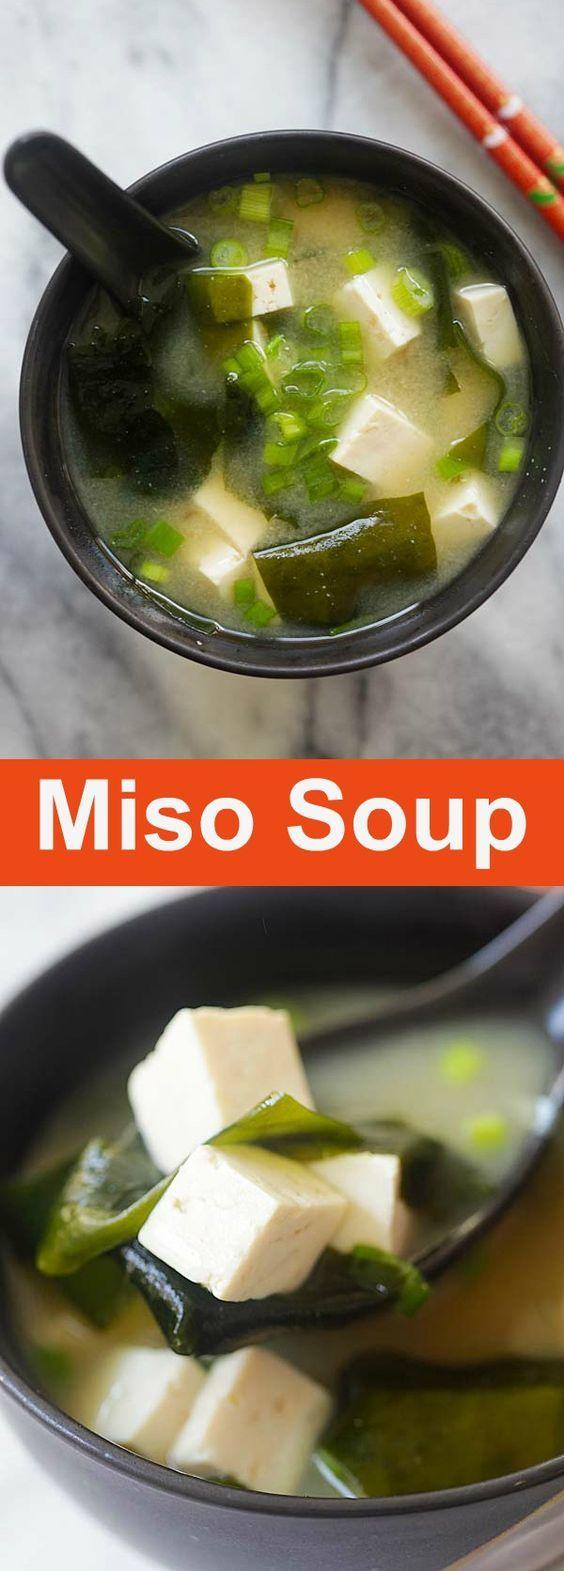 Easy Miso Soup #SOUP #MAINCOURSE